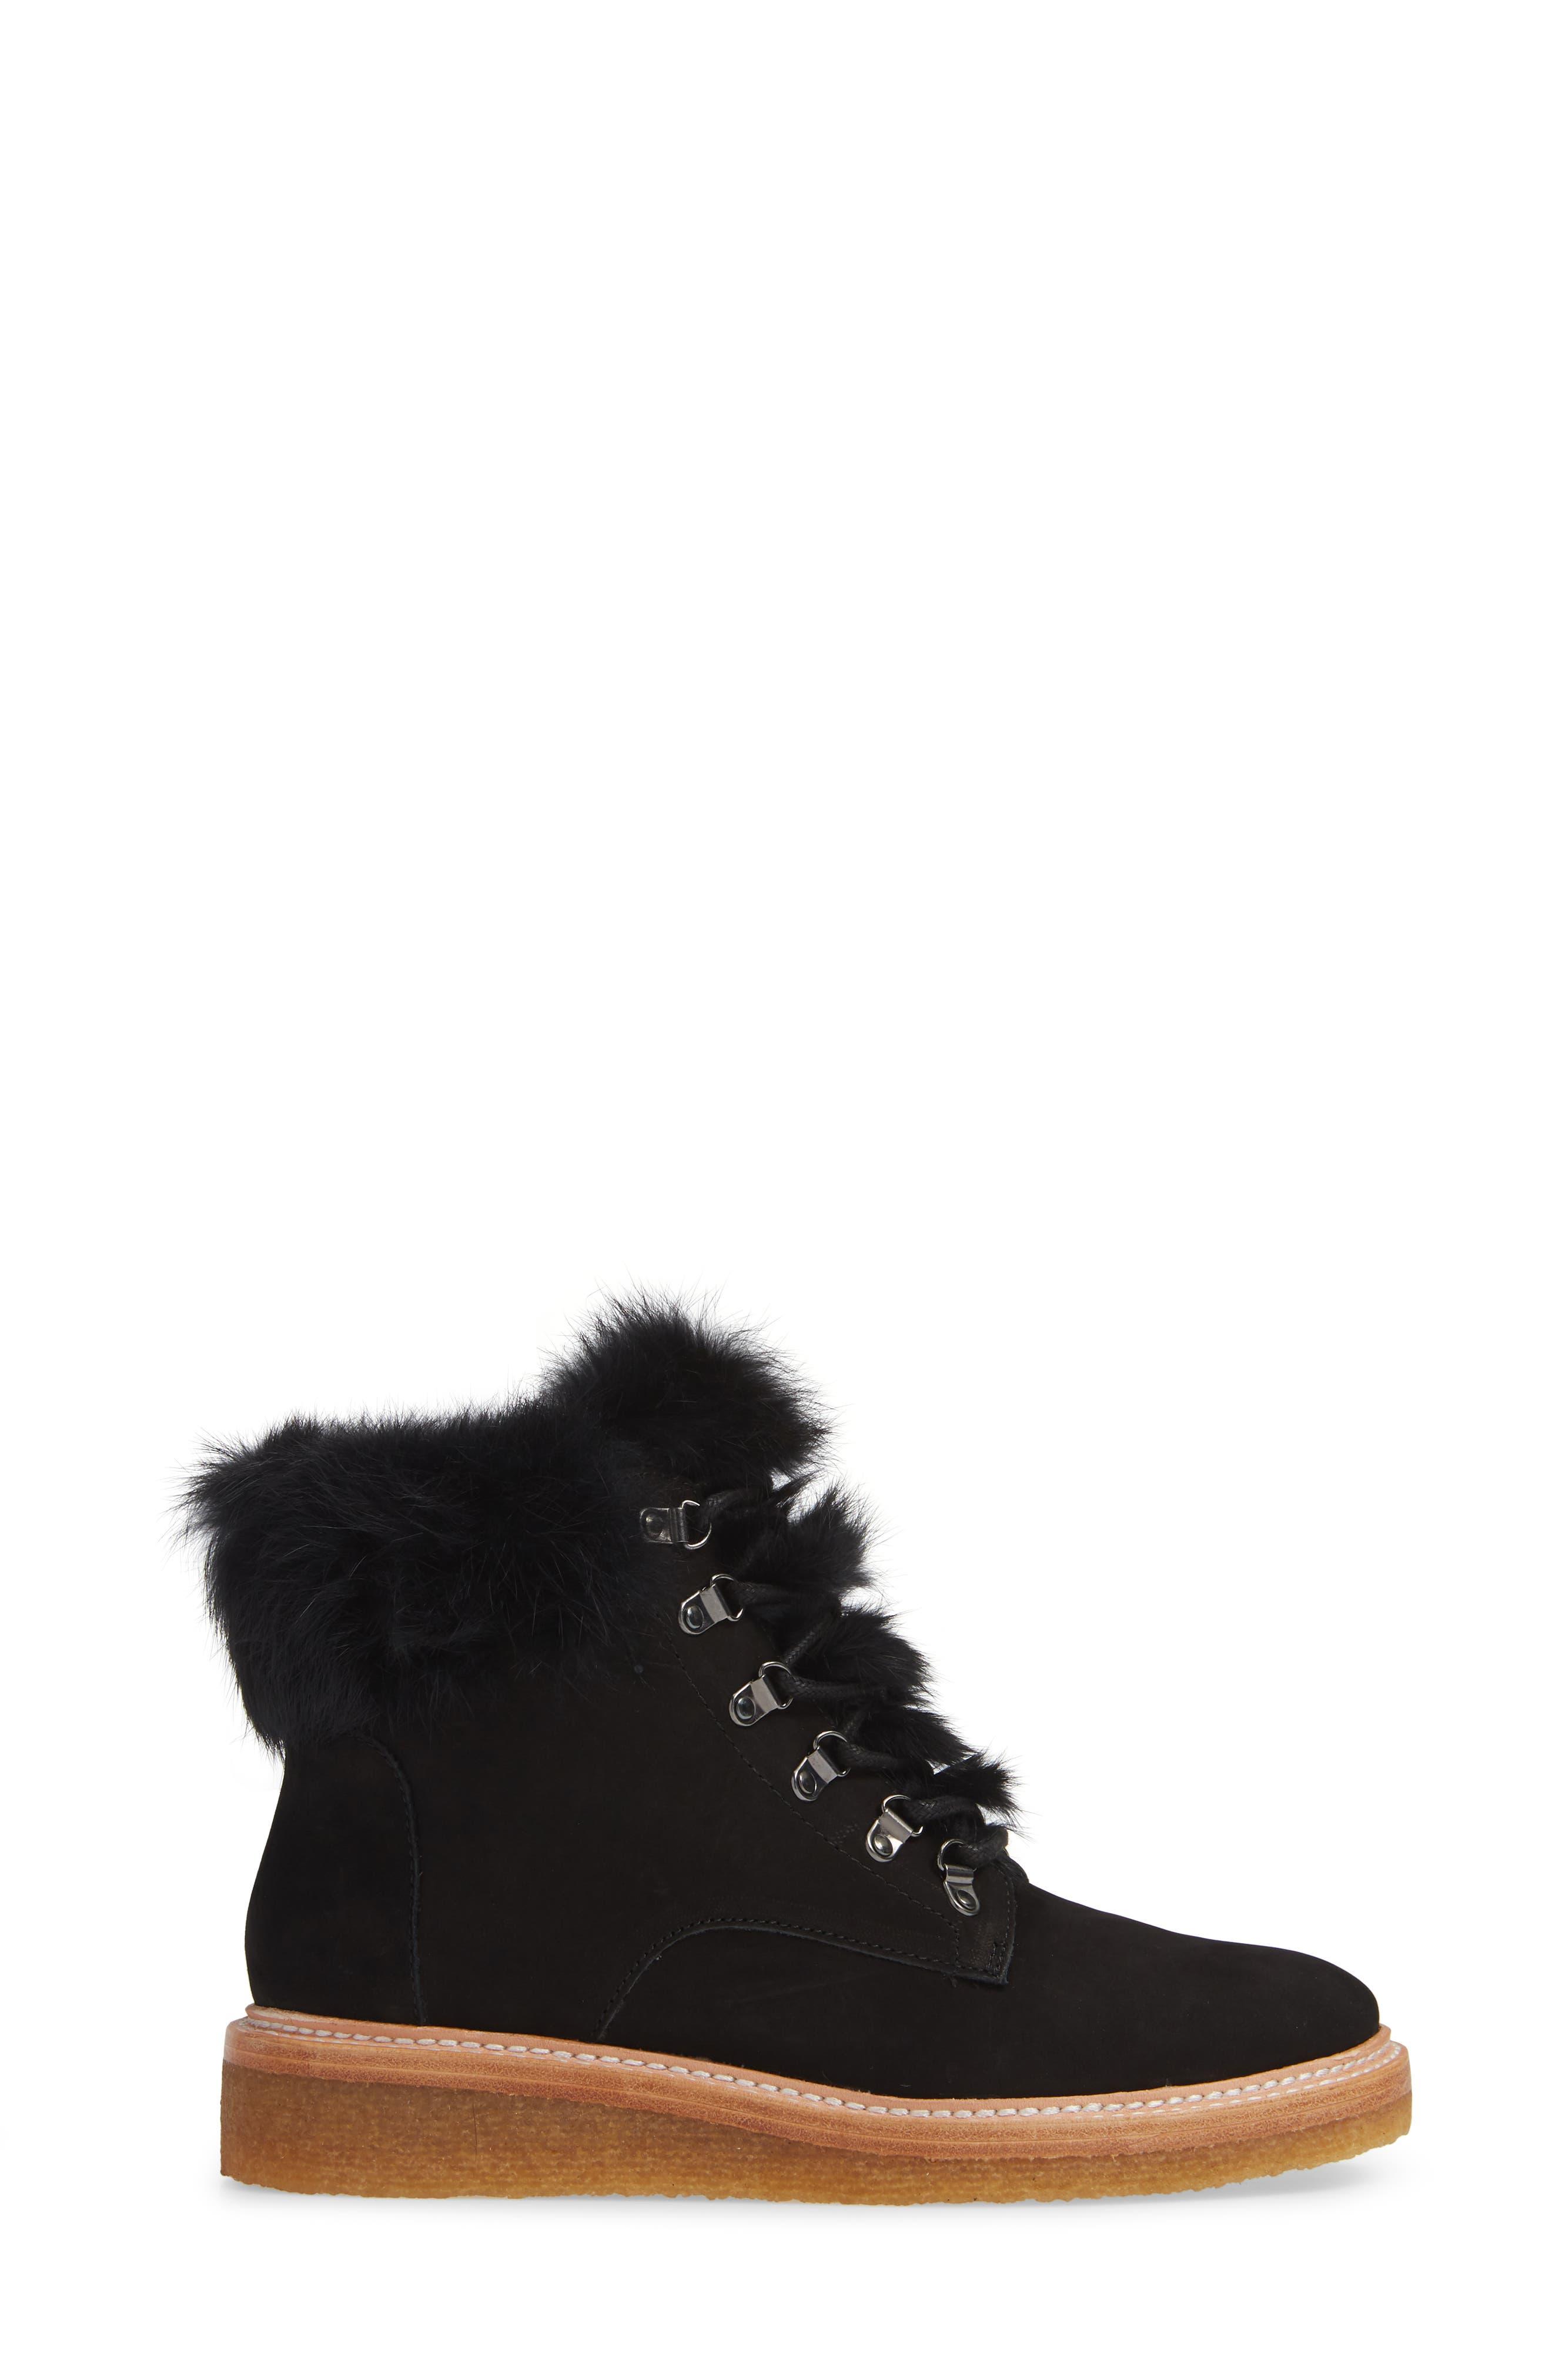 BOTKIER,                             Winter Genuine Rabbit Fur Trim Boot,                             Alternate thumbnail 3, color,                             BLACK SUEDE